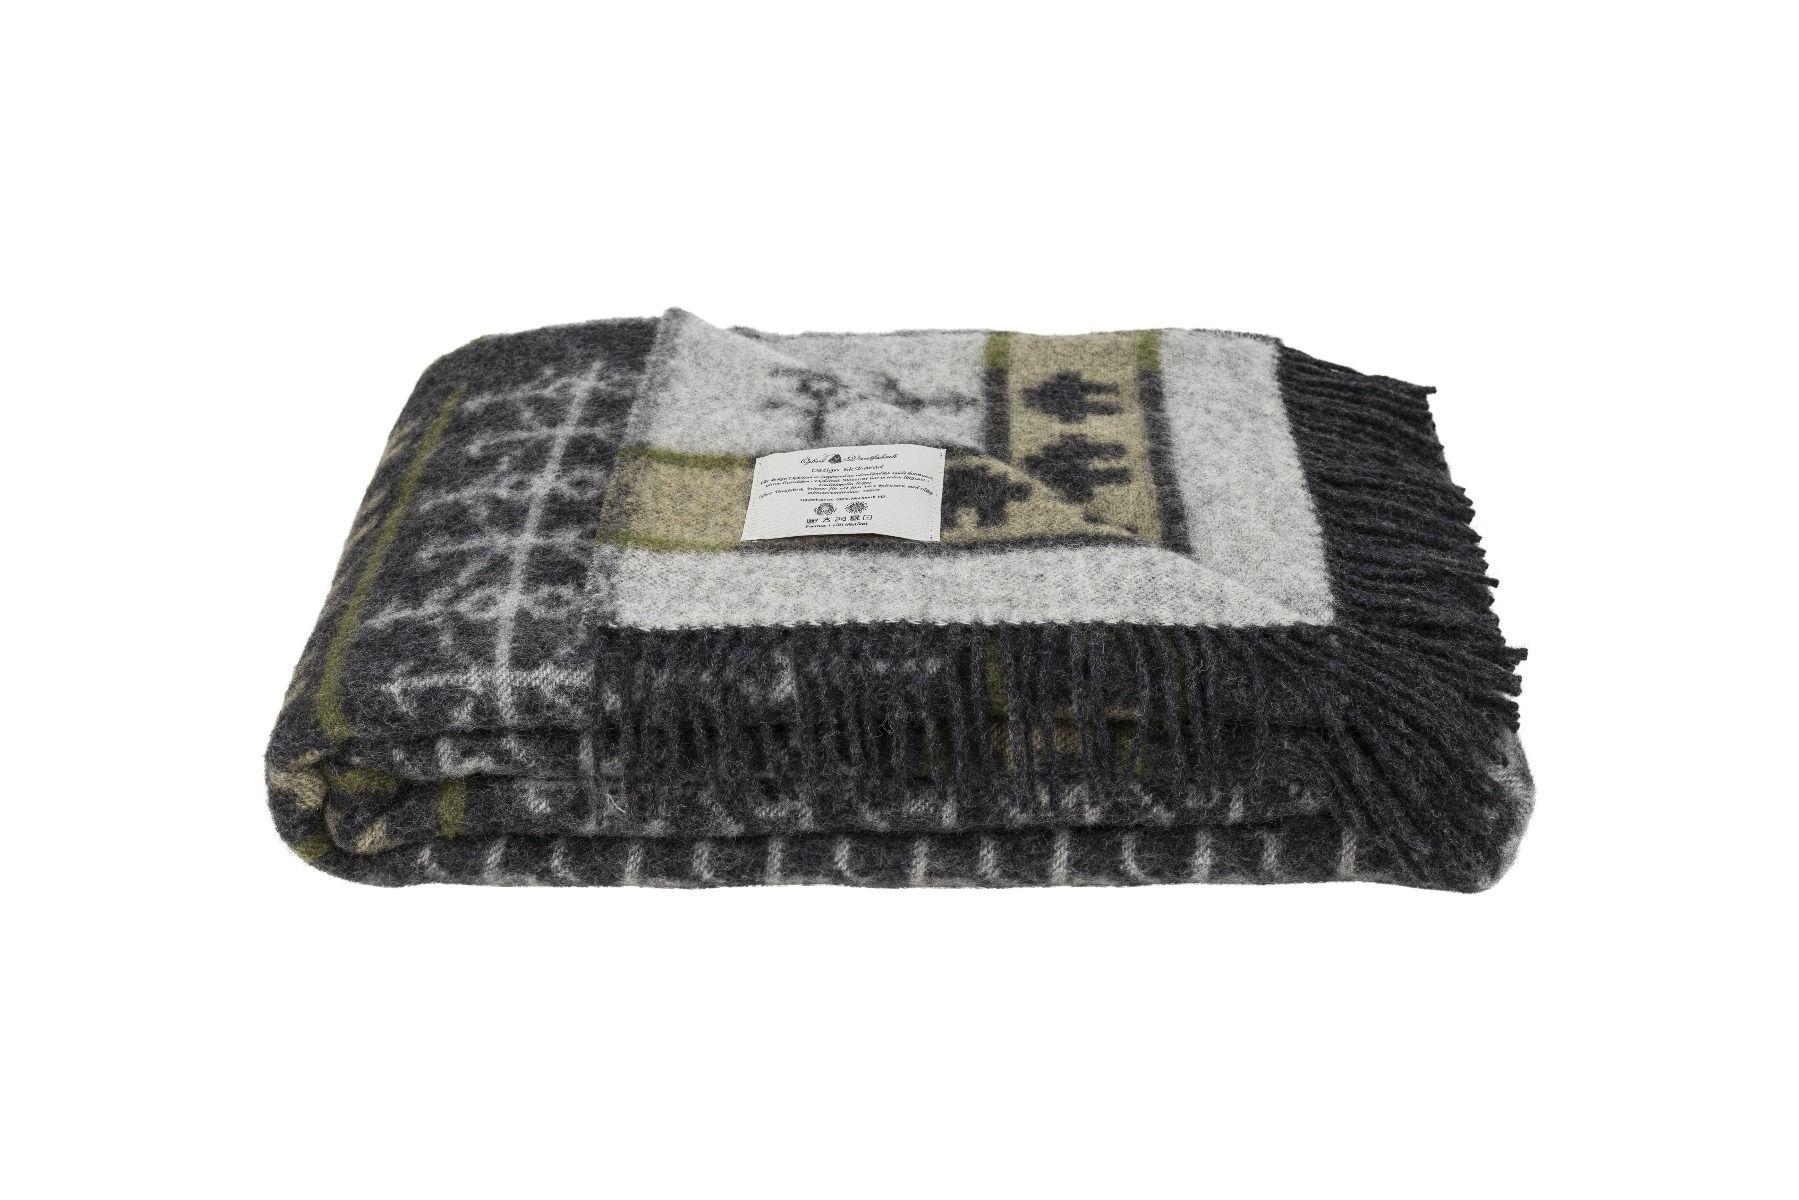 Öjbro Ekshärad Sot 100% Merino Wool Blanket 130x220cm